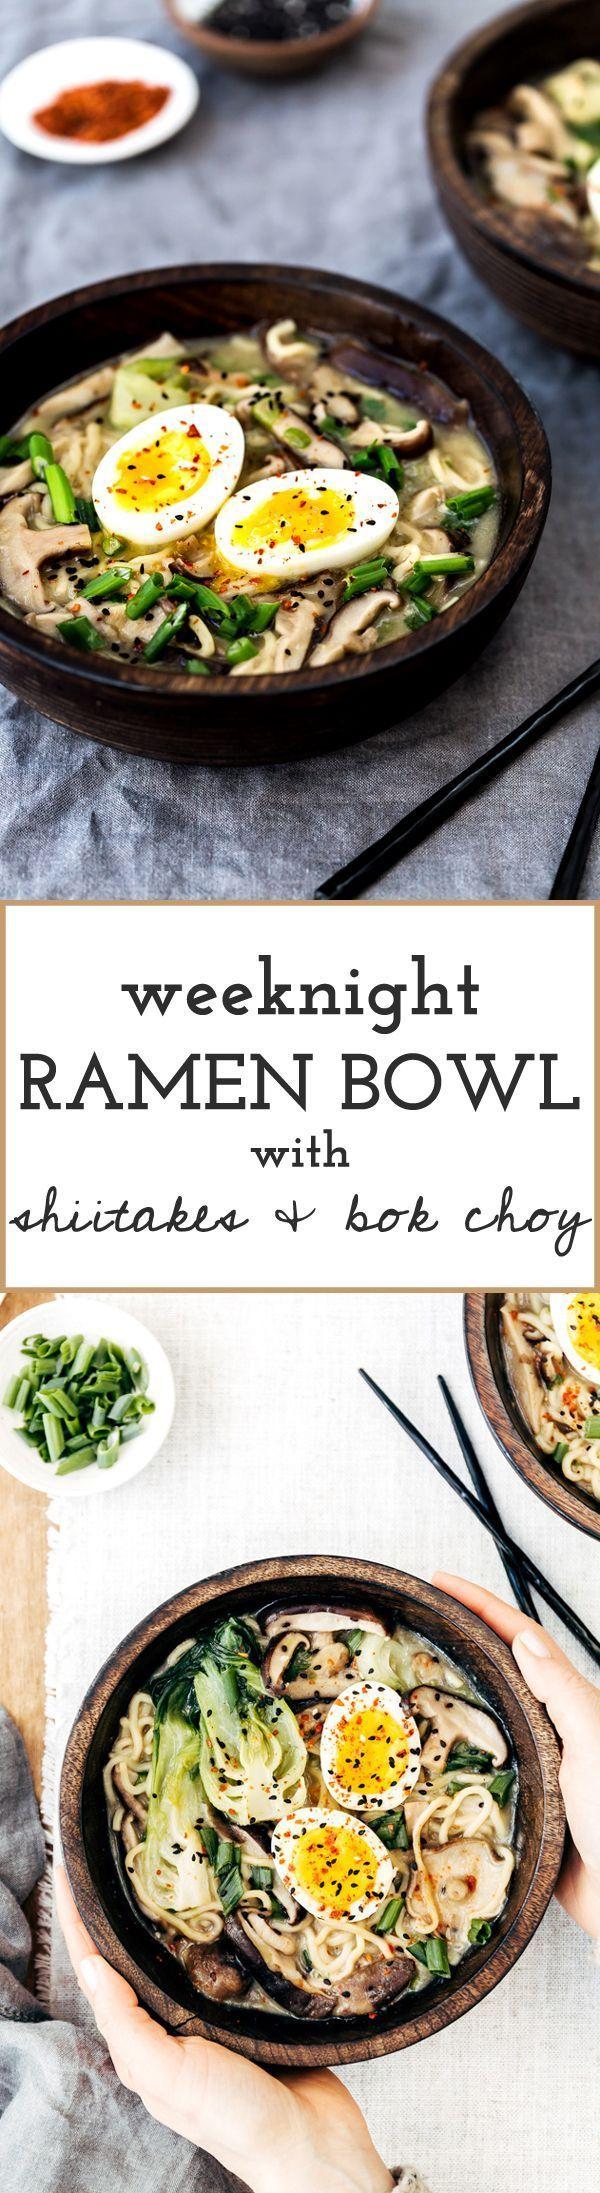 Weeknight Vegetarian Ramen Bowl with Shiitake Mushrooms and Bok Choy - Ready in 30 min! #recipe #weeknight #dinnerrecipes #dinner #ramennoodles #ramen